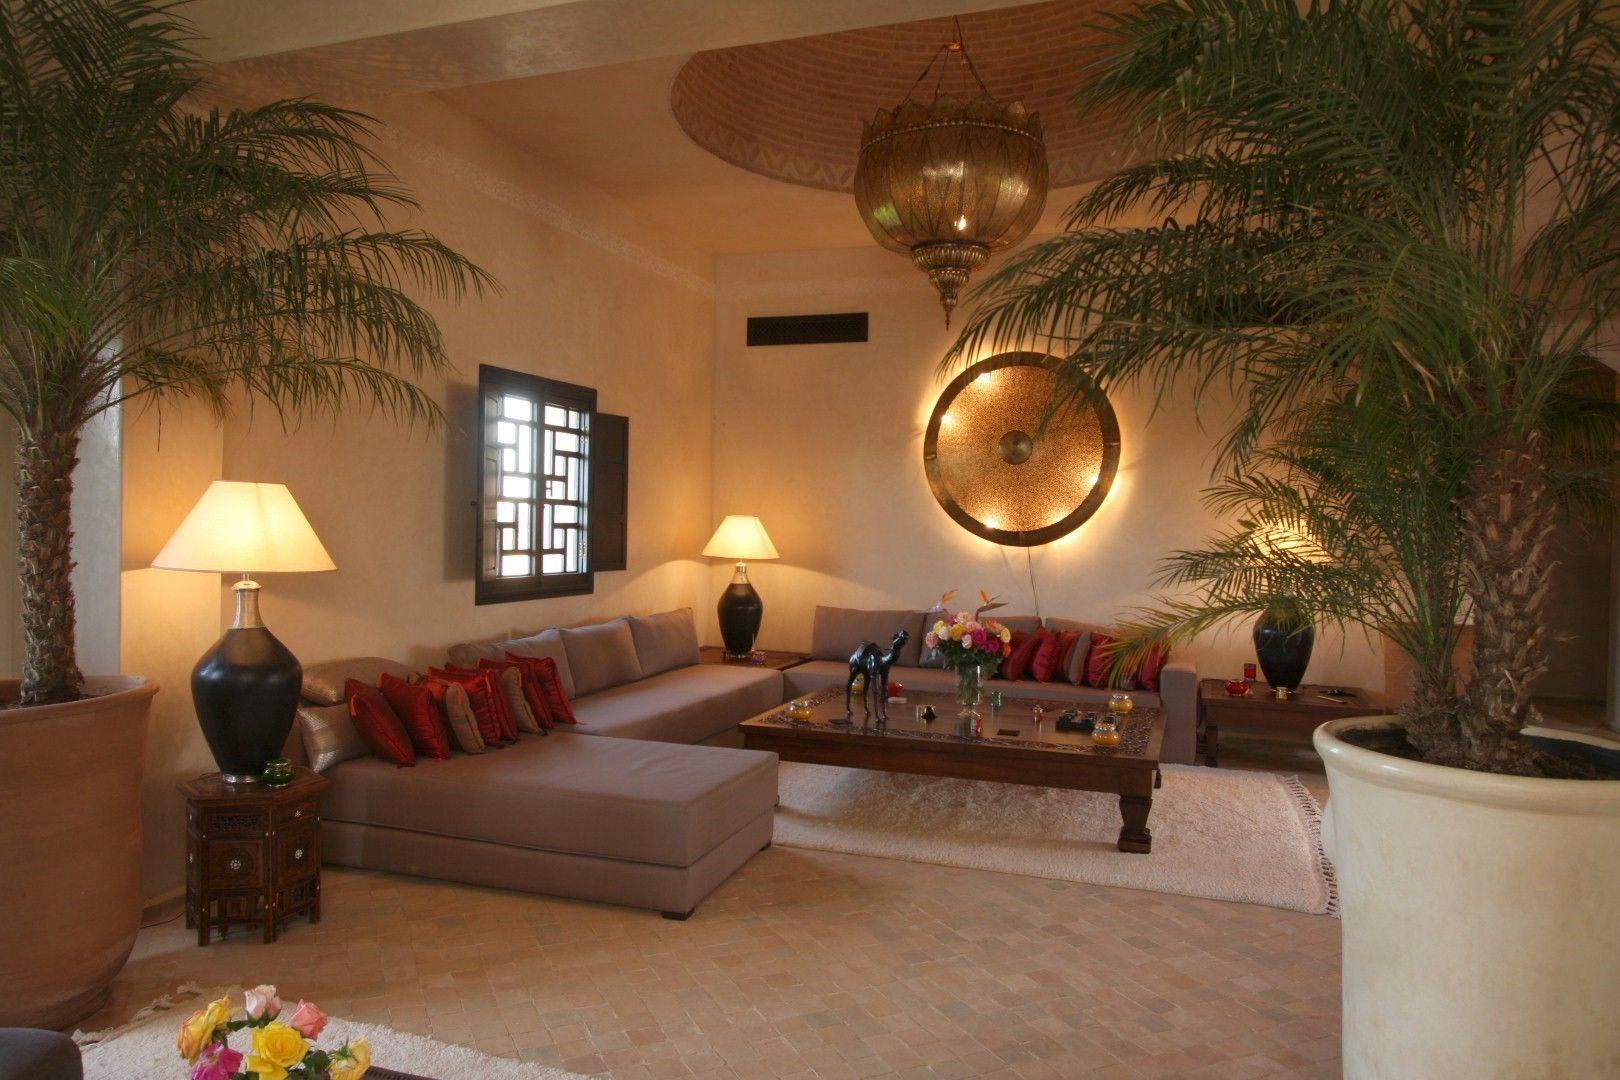 Salon Marocain  Moroccan Design  Pinterest  Salons Salon marocain and Living rooms